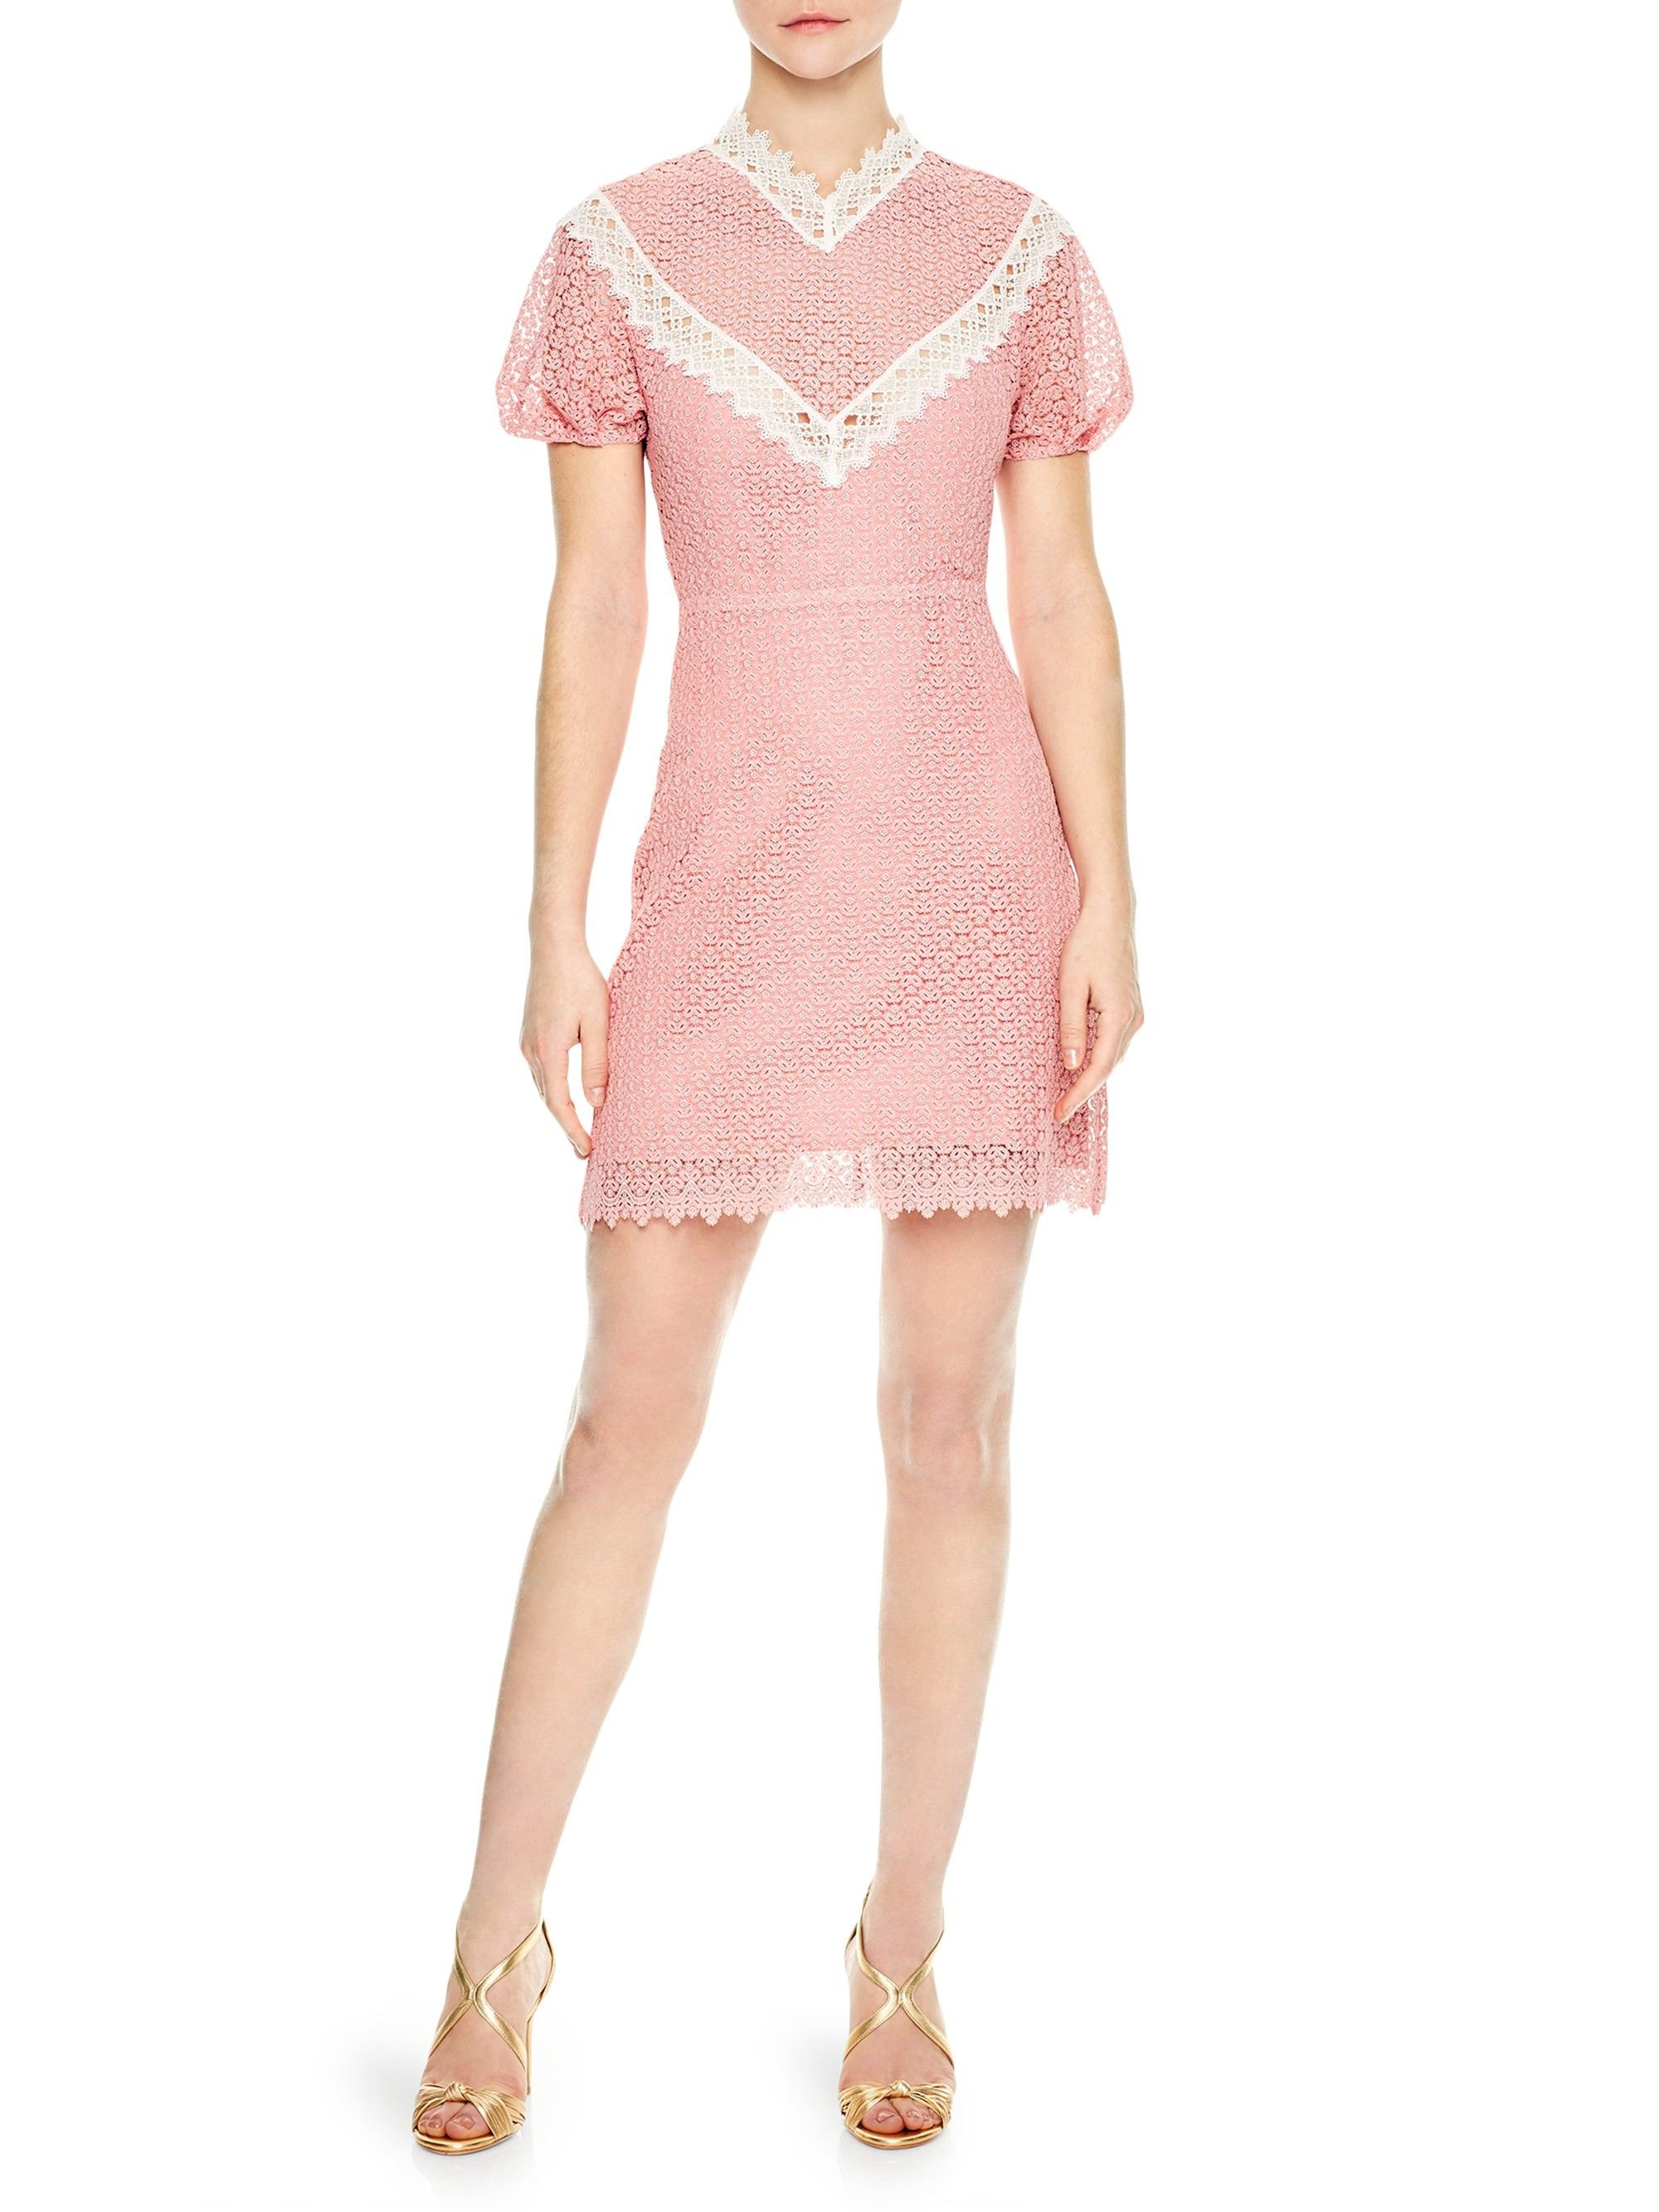 50b07693a8b Sandro Gavin Lace Sheath Dress - Peony 40 (8)